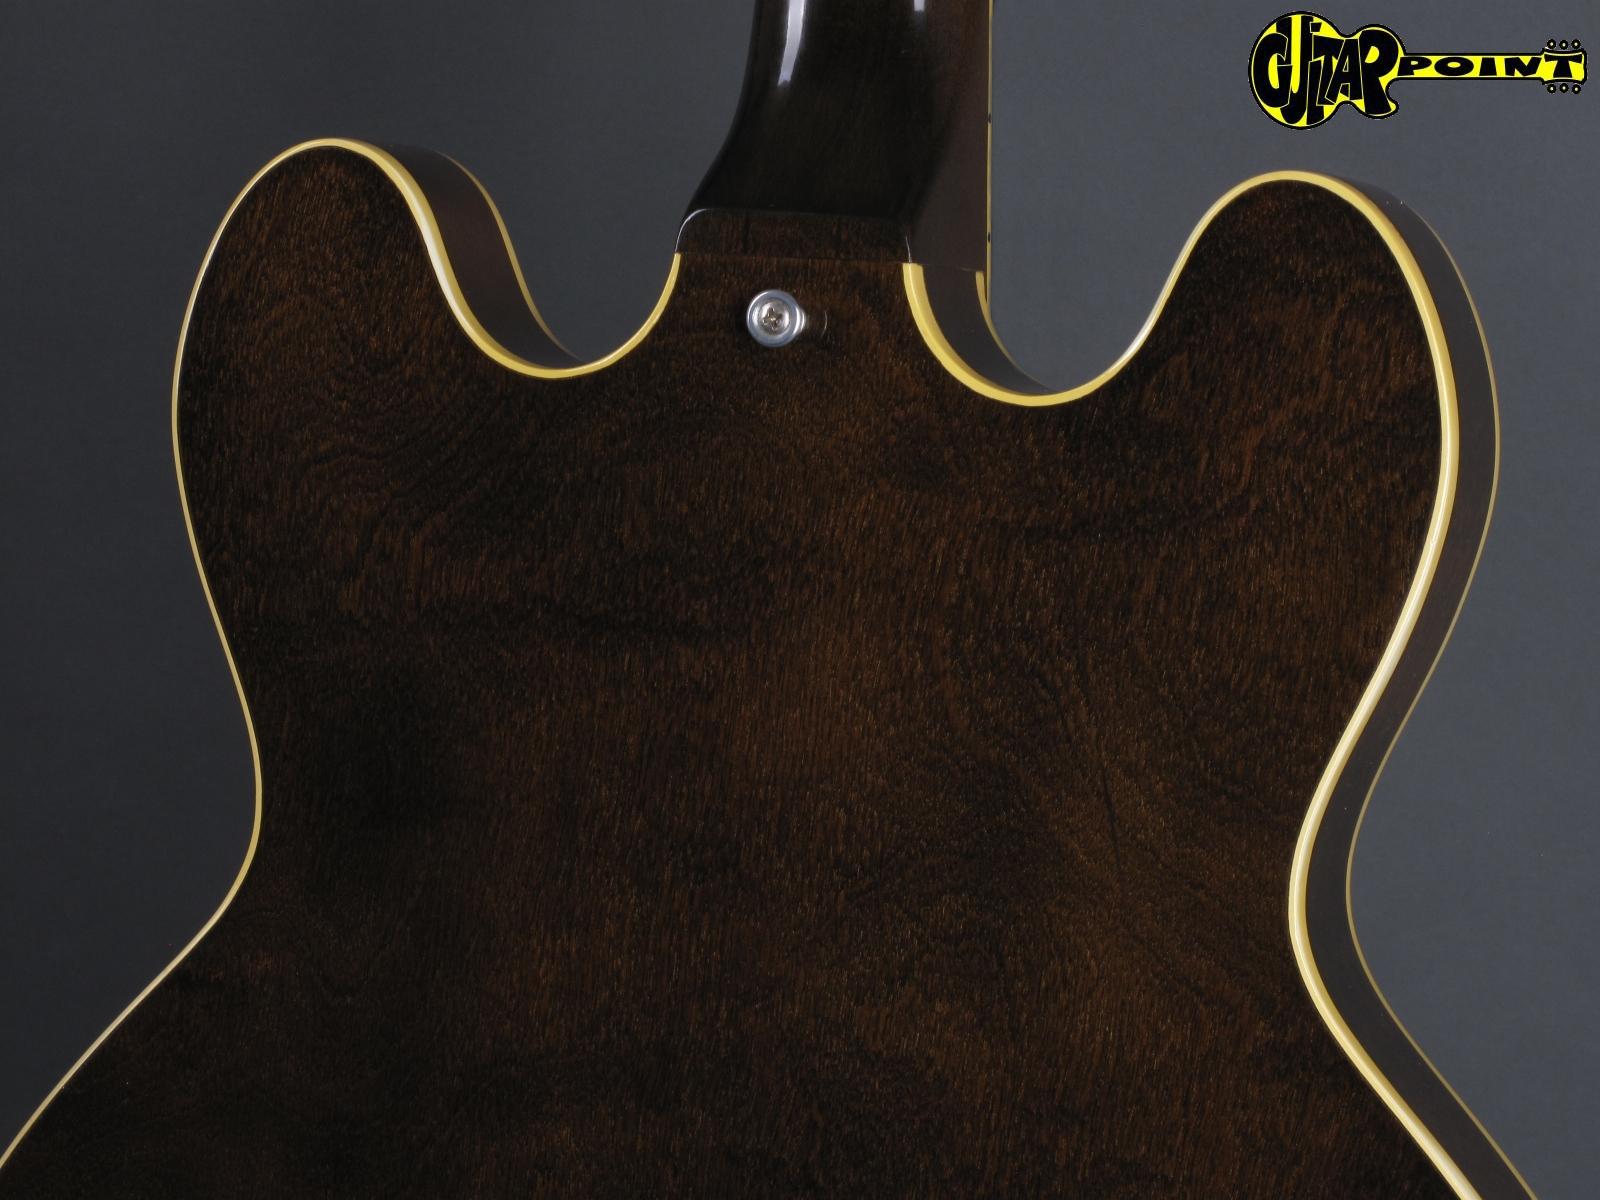 1971 Gibson Es 340 Tdw Walnut Vi71gies340tdw963833 Guild Guitar Wiring Diagram